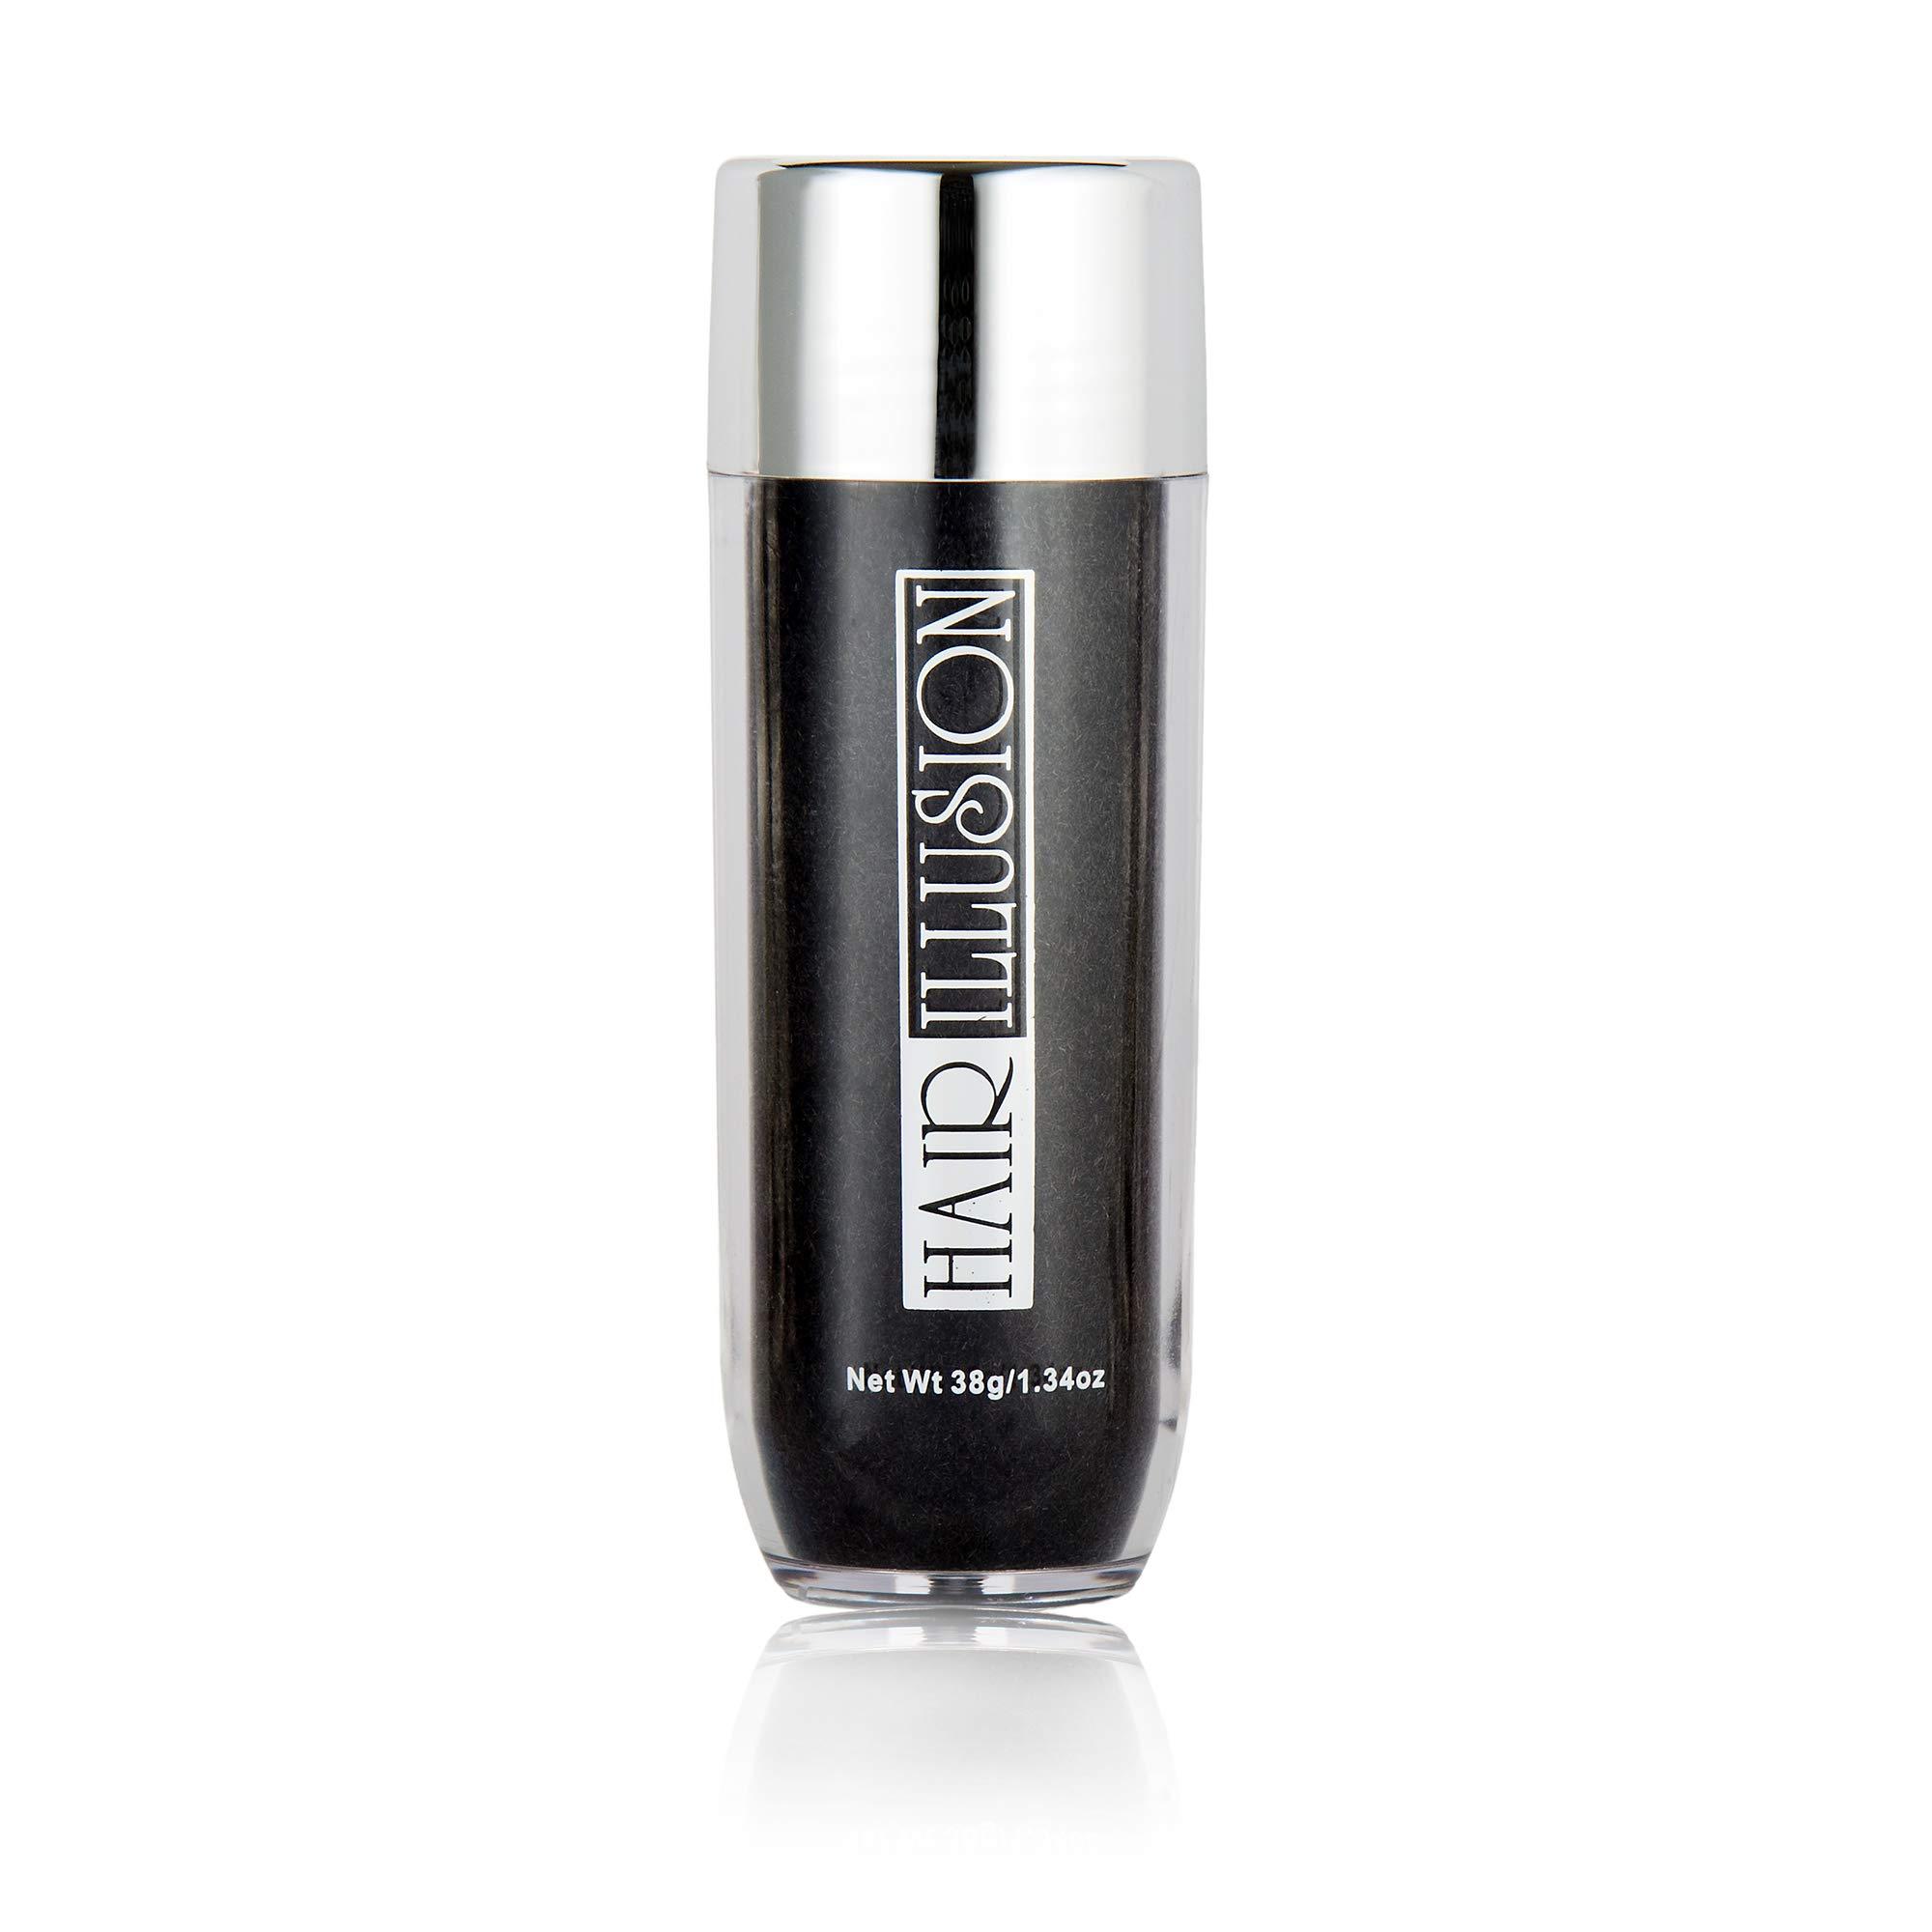 HAIR ILLUSION - 100% Natural Real Hair Fibers, Premium Quality For Men and Women (38g, black)